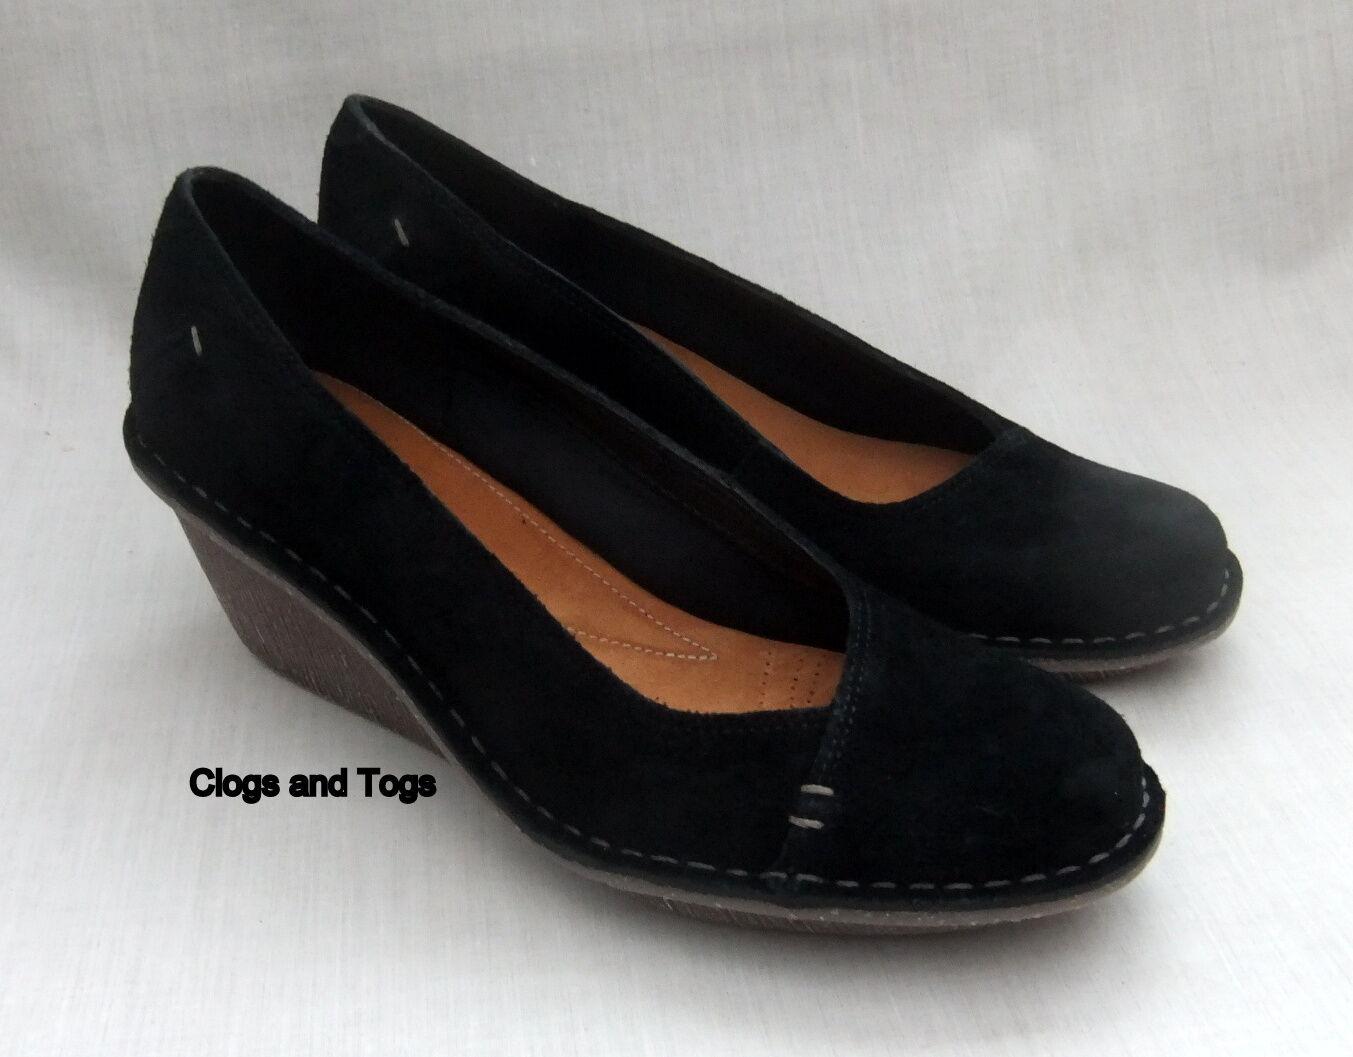 NEW CLARKS HARLAN BEACH Damenschuhe BLACK SUEDE / WEDGE Schuhe SIZE 6.5 / SUEDE 40 7c8ea6